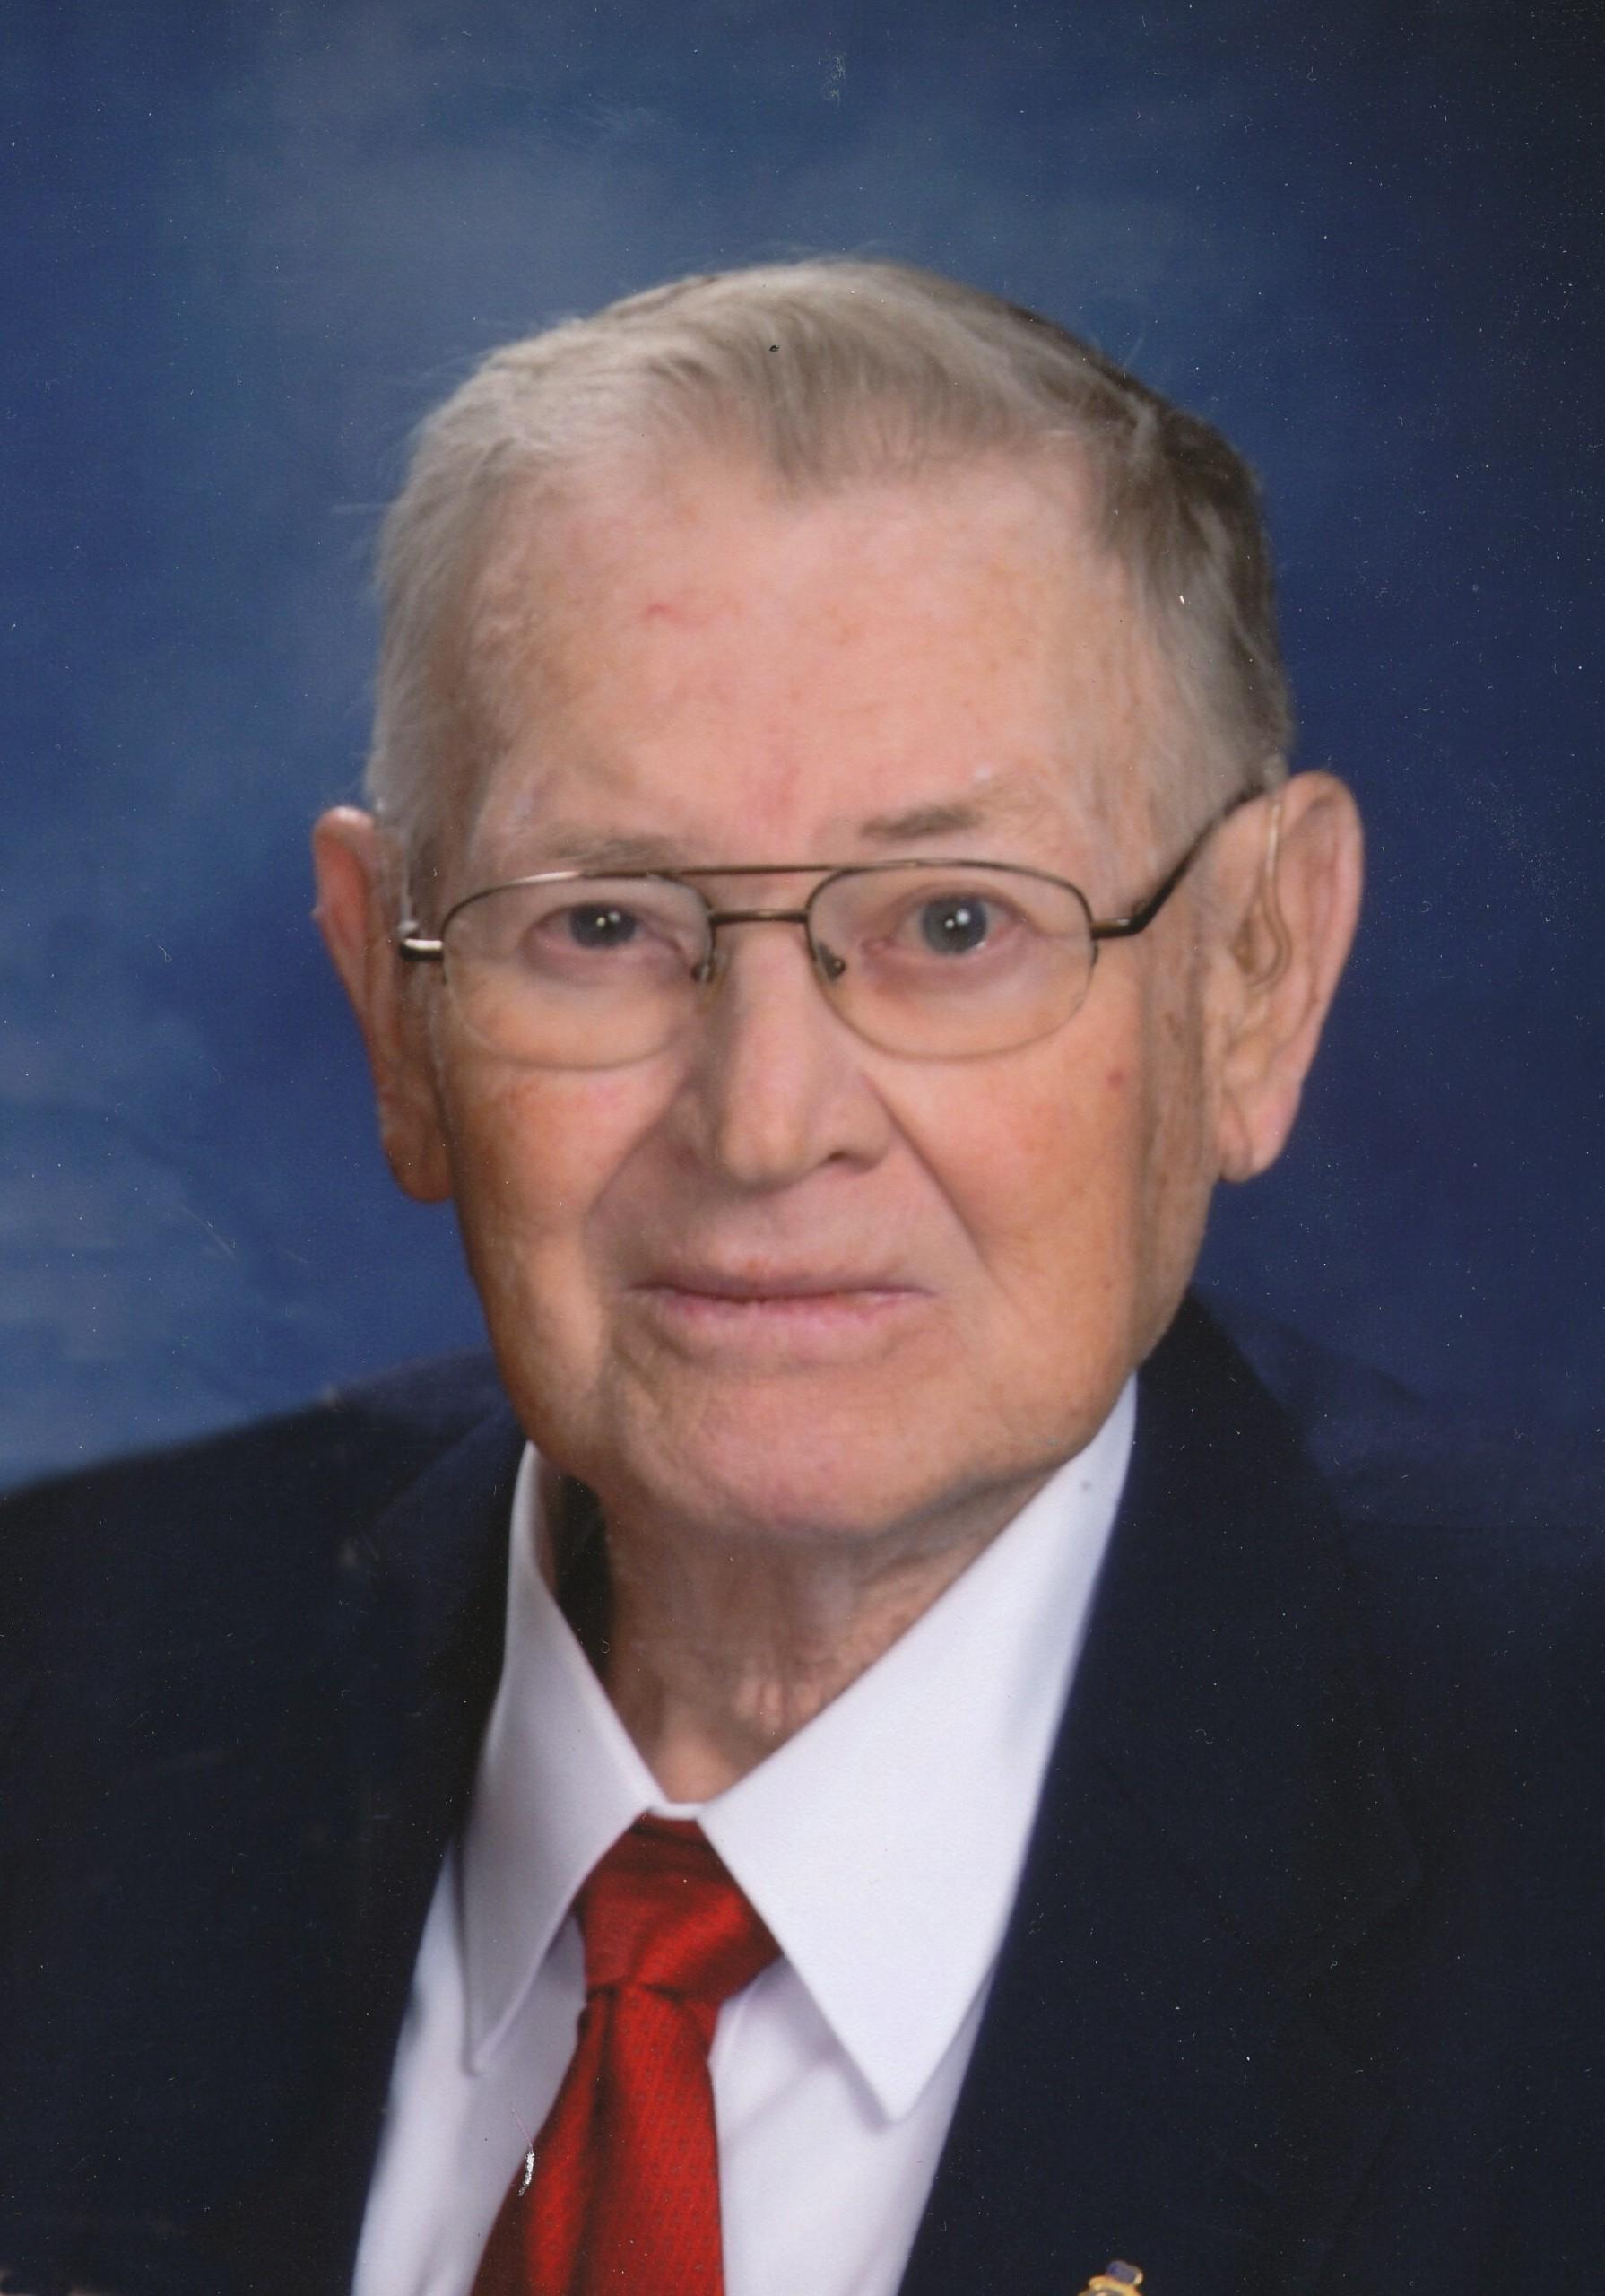 Kenneth H. Kauffold, age 87, of Dodge, Nebraska